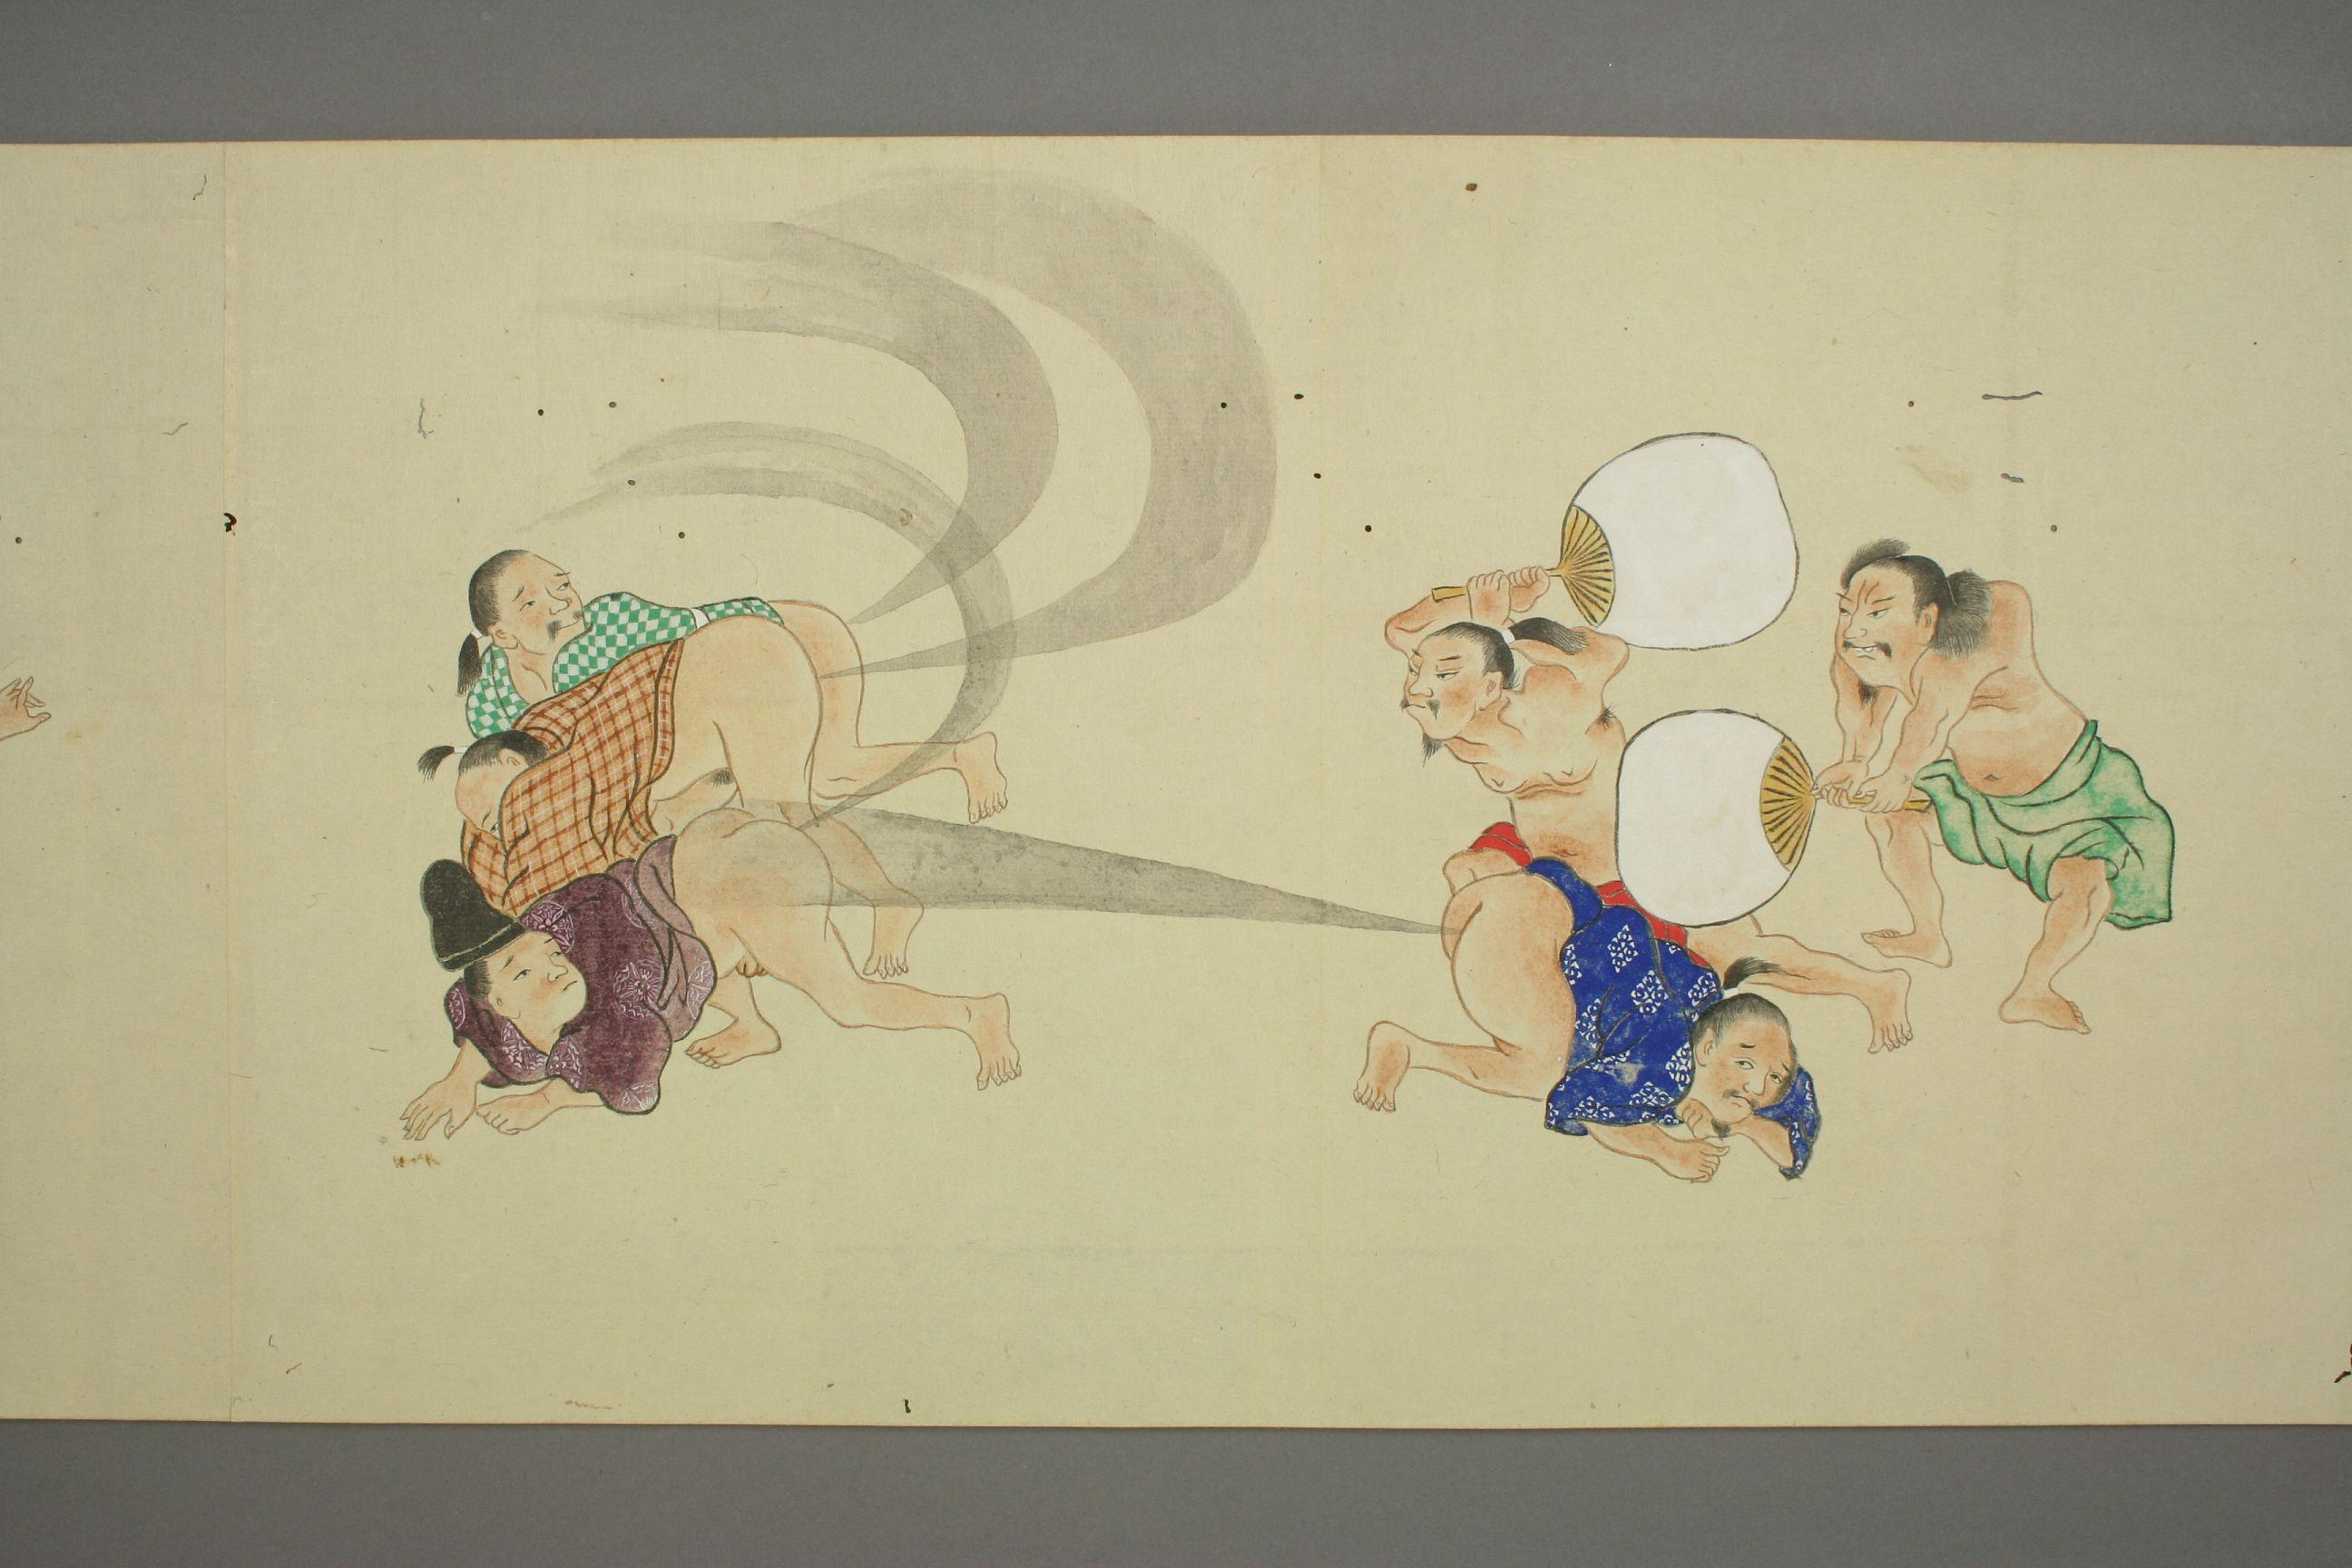 http://archive.wul.waseda.ac.jp/kosho/chi04/chi04_01029/chi04_01029_p0010.jpg